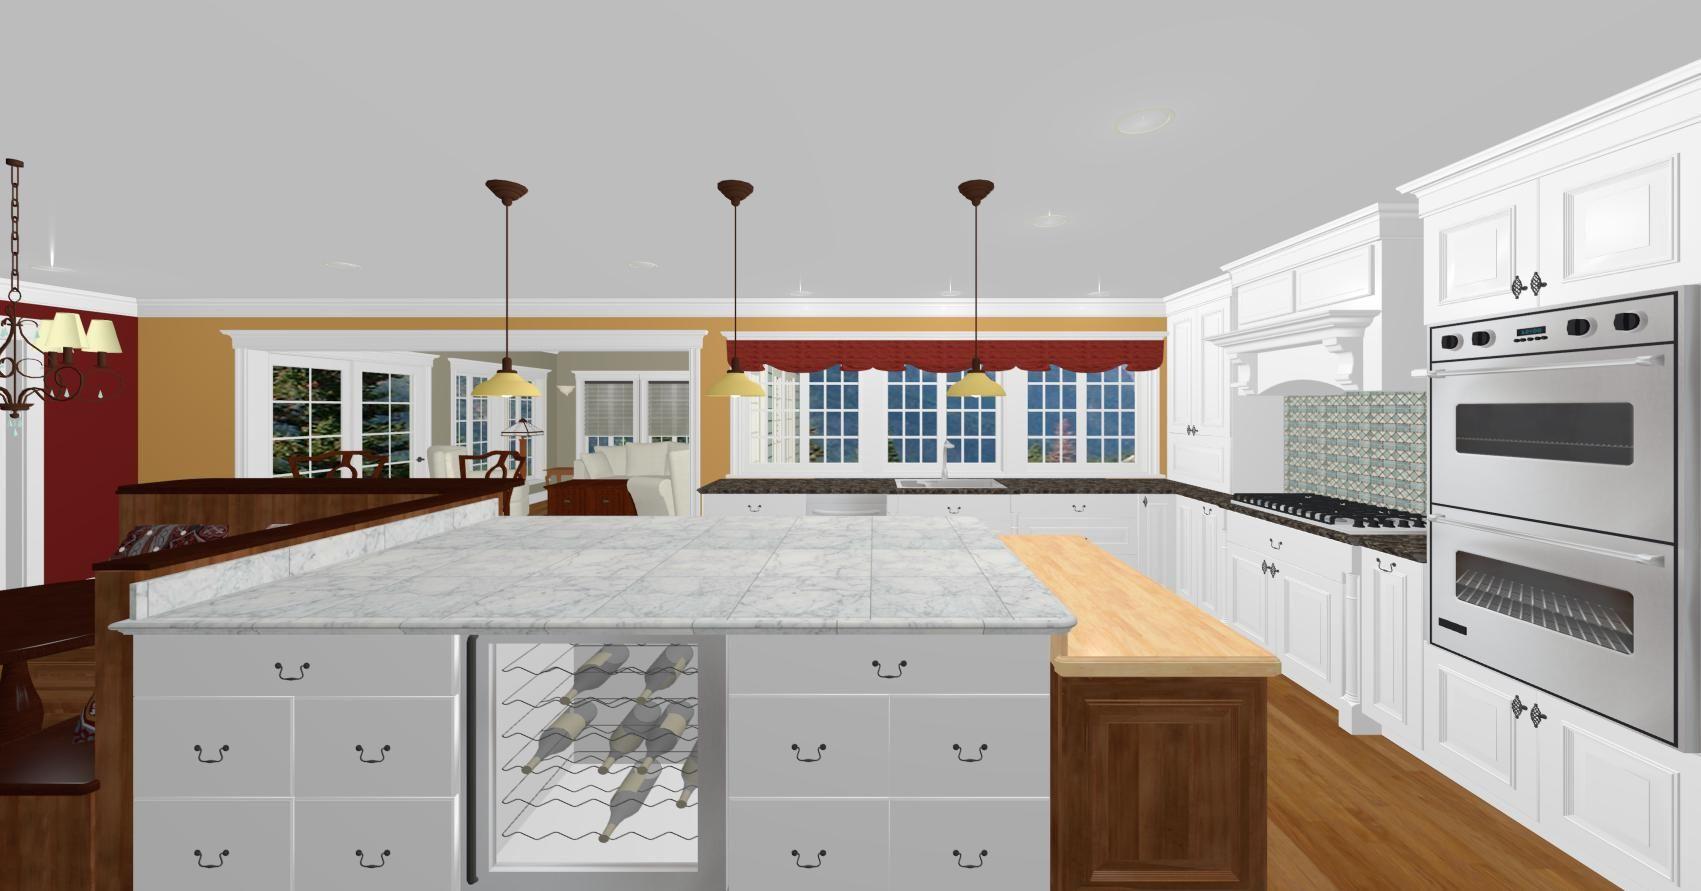 New kitchen island with wine cooler drop down butcher block top